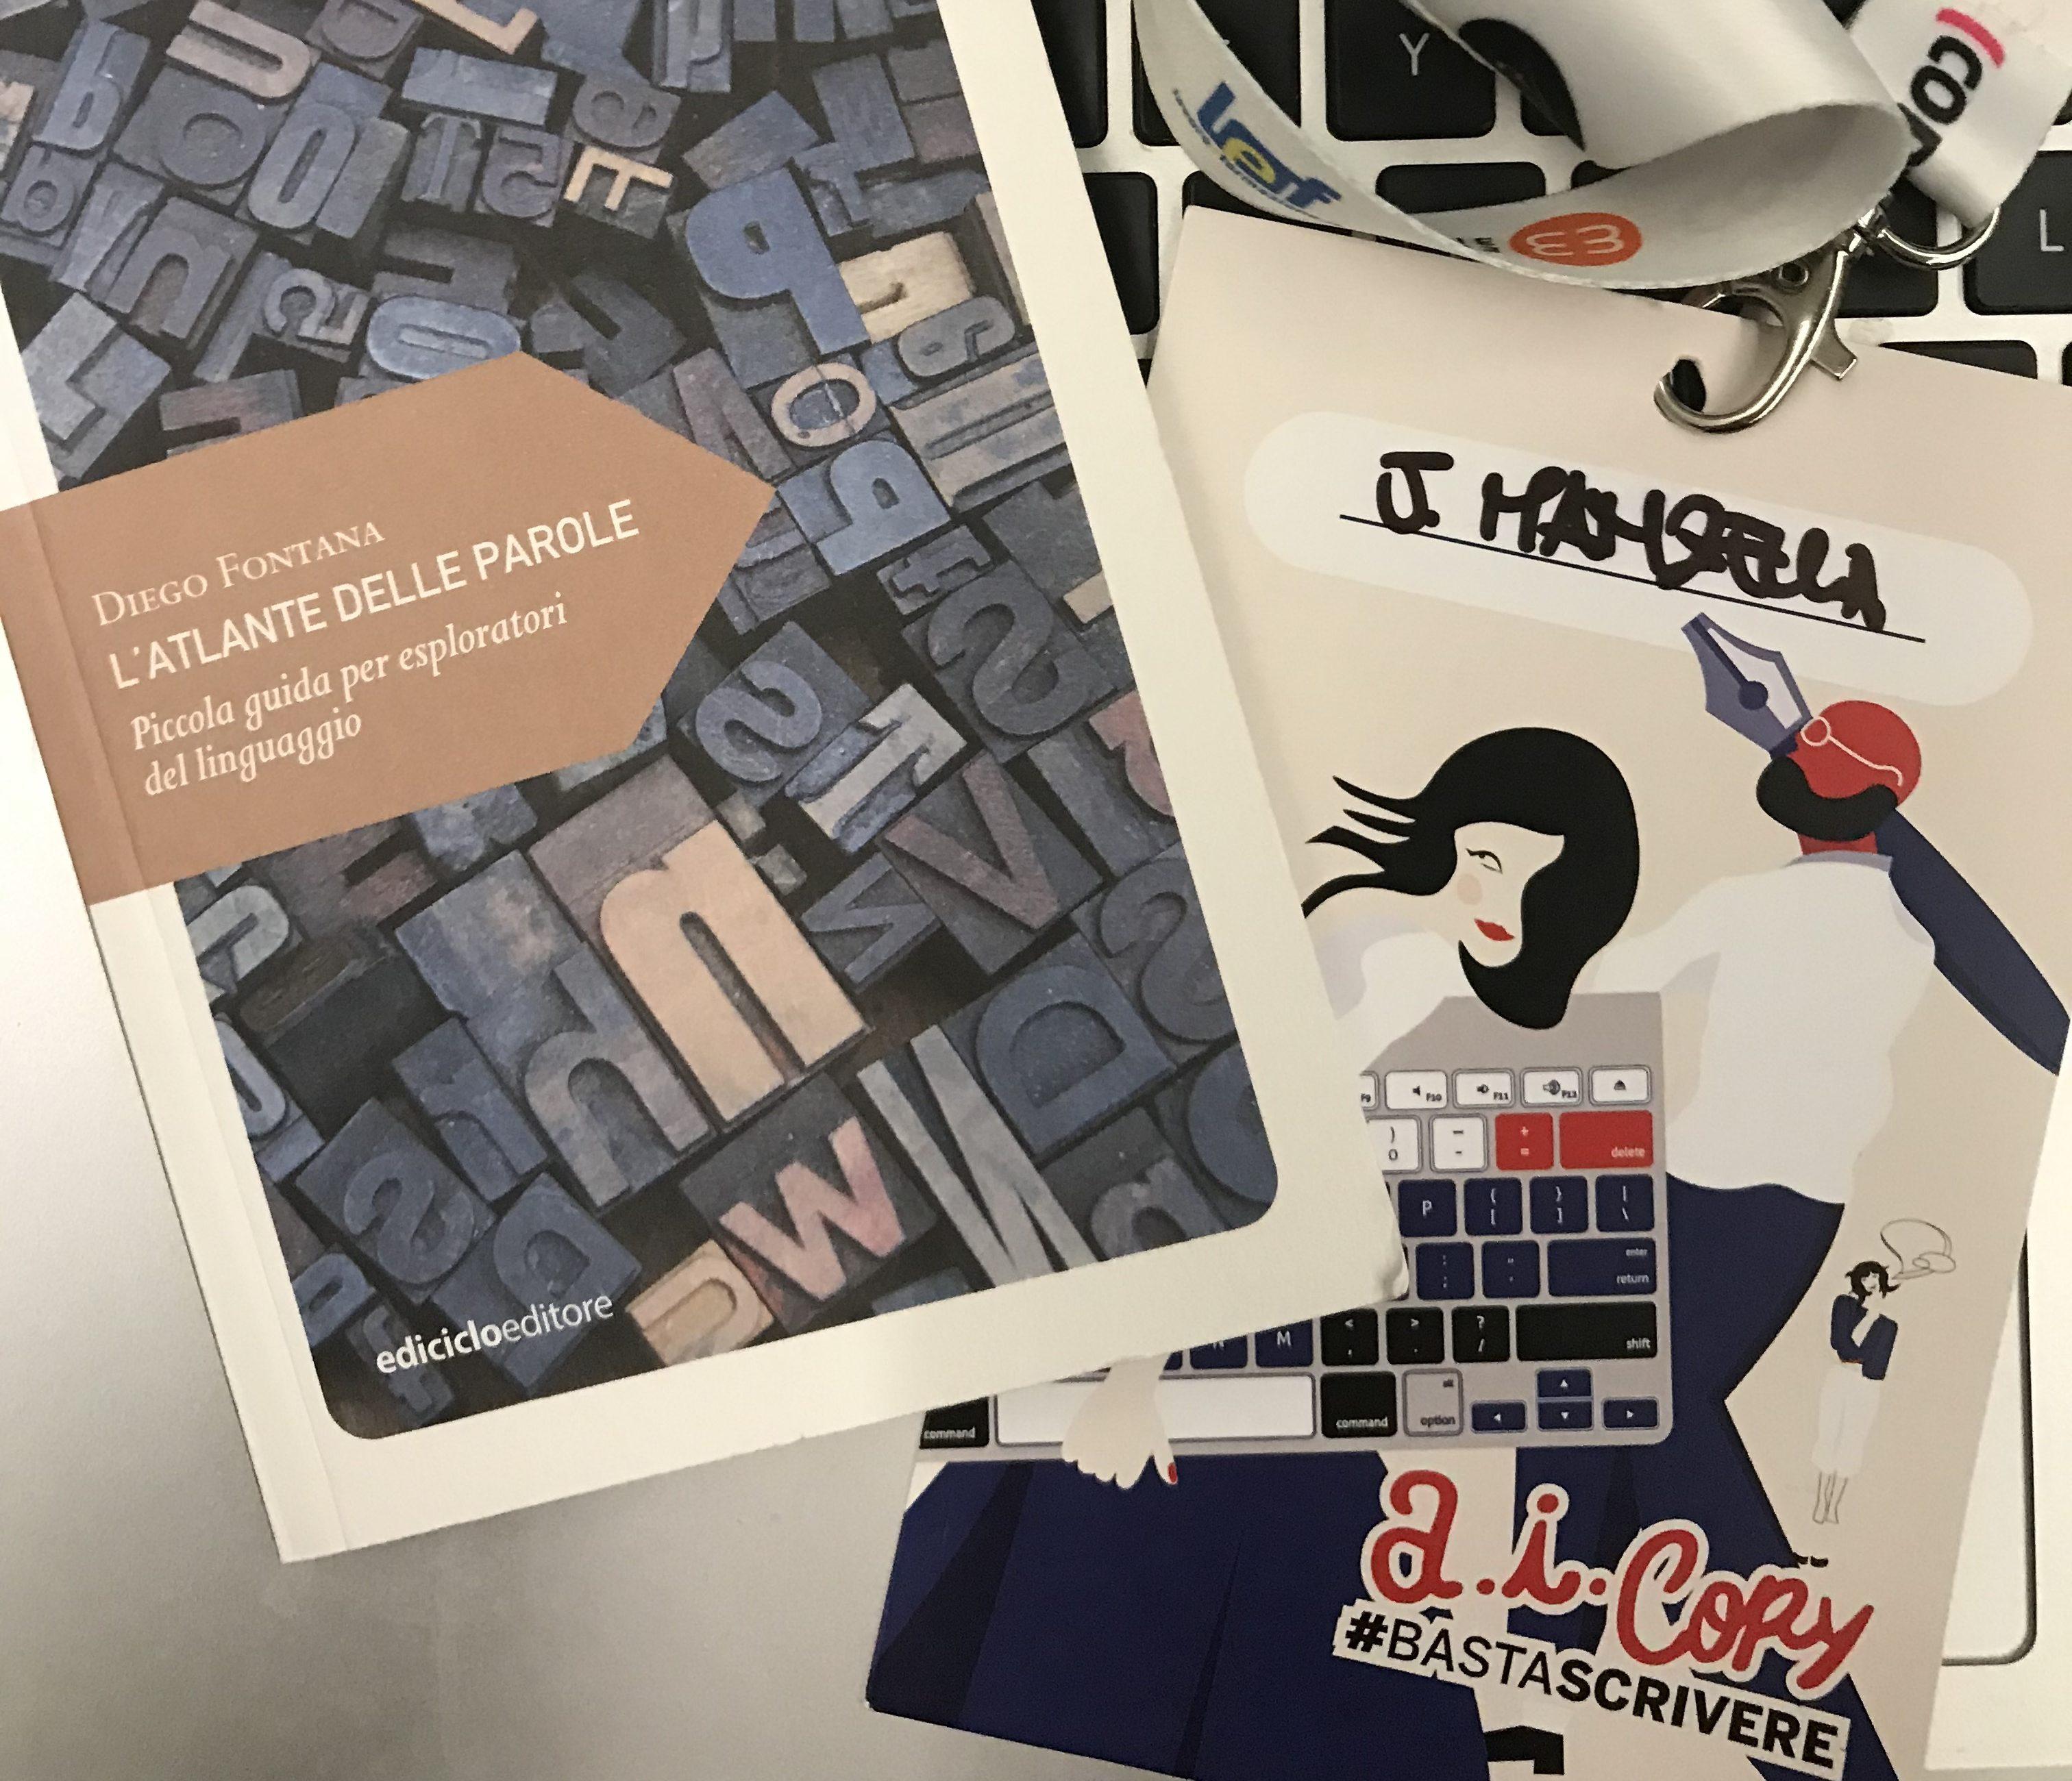 La dedica di Diego Fontana a Basta Scrivere AICopy 2019